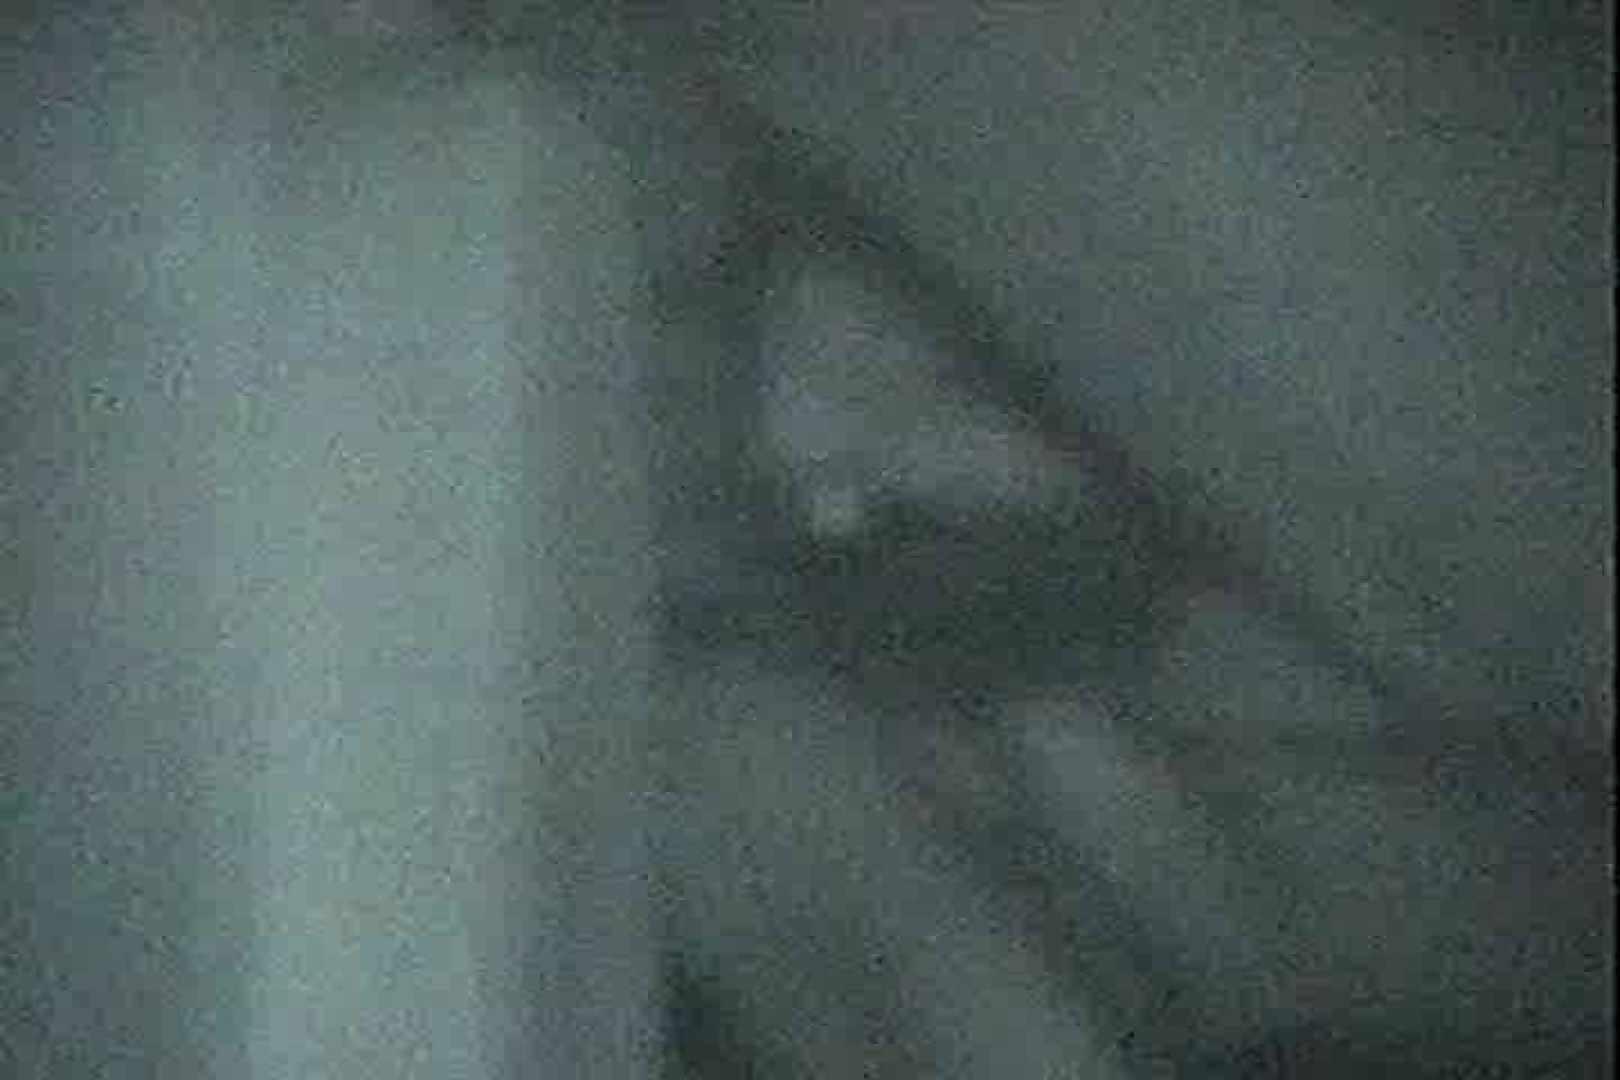 充血監督の深夜の運動会Vol.41 0  96連発 91